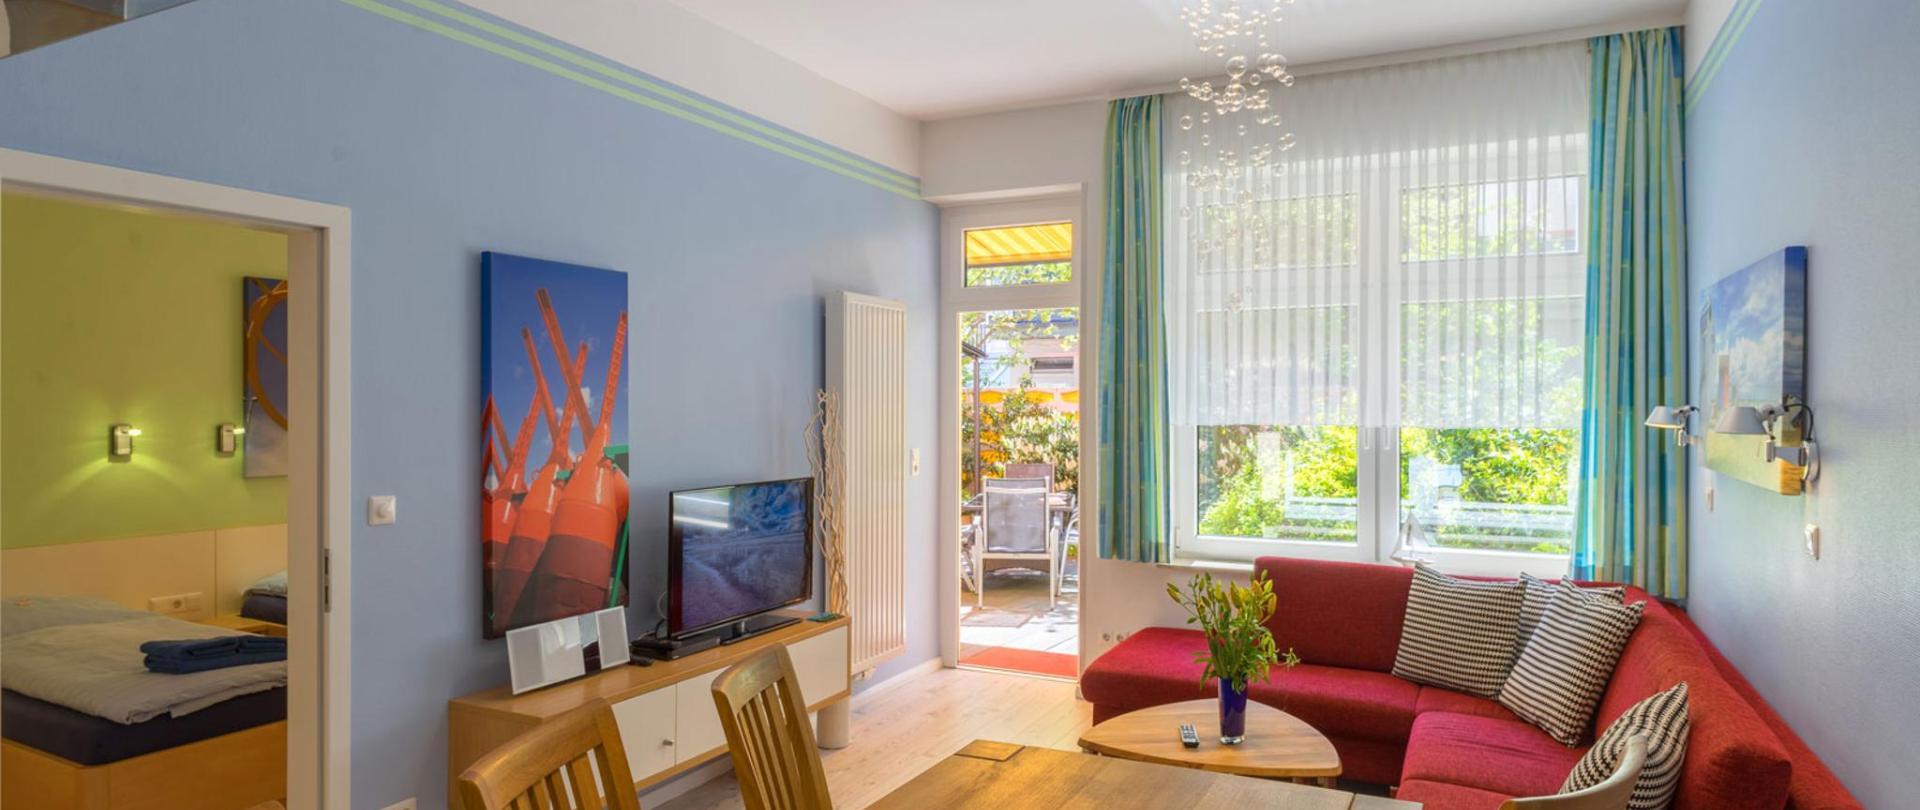 neyland apartments Norderney